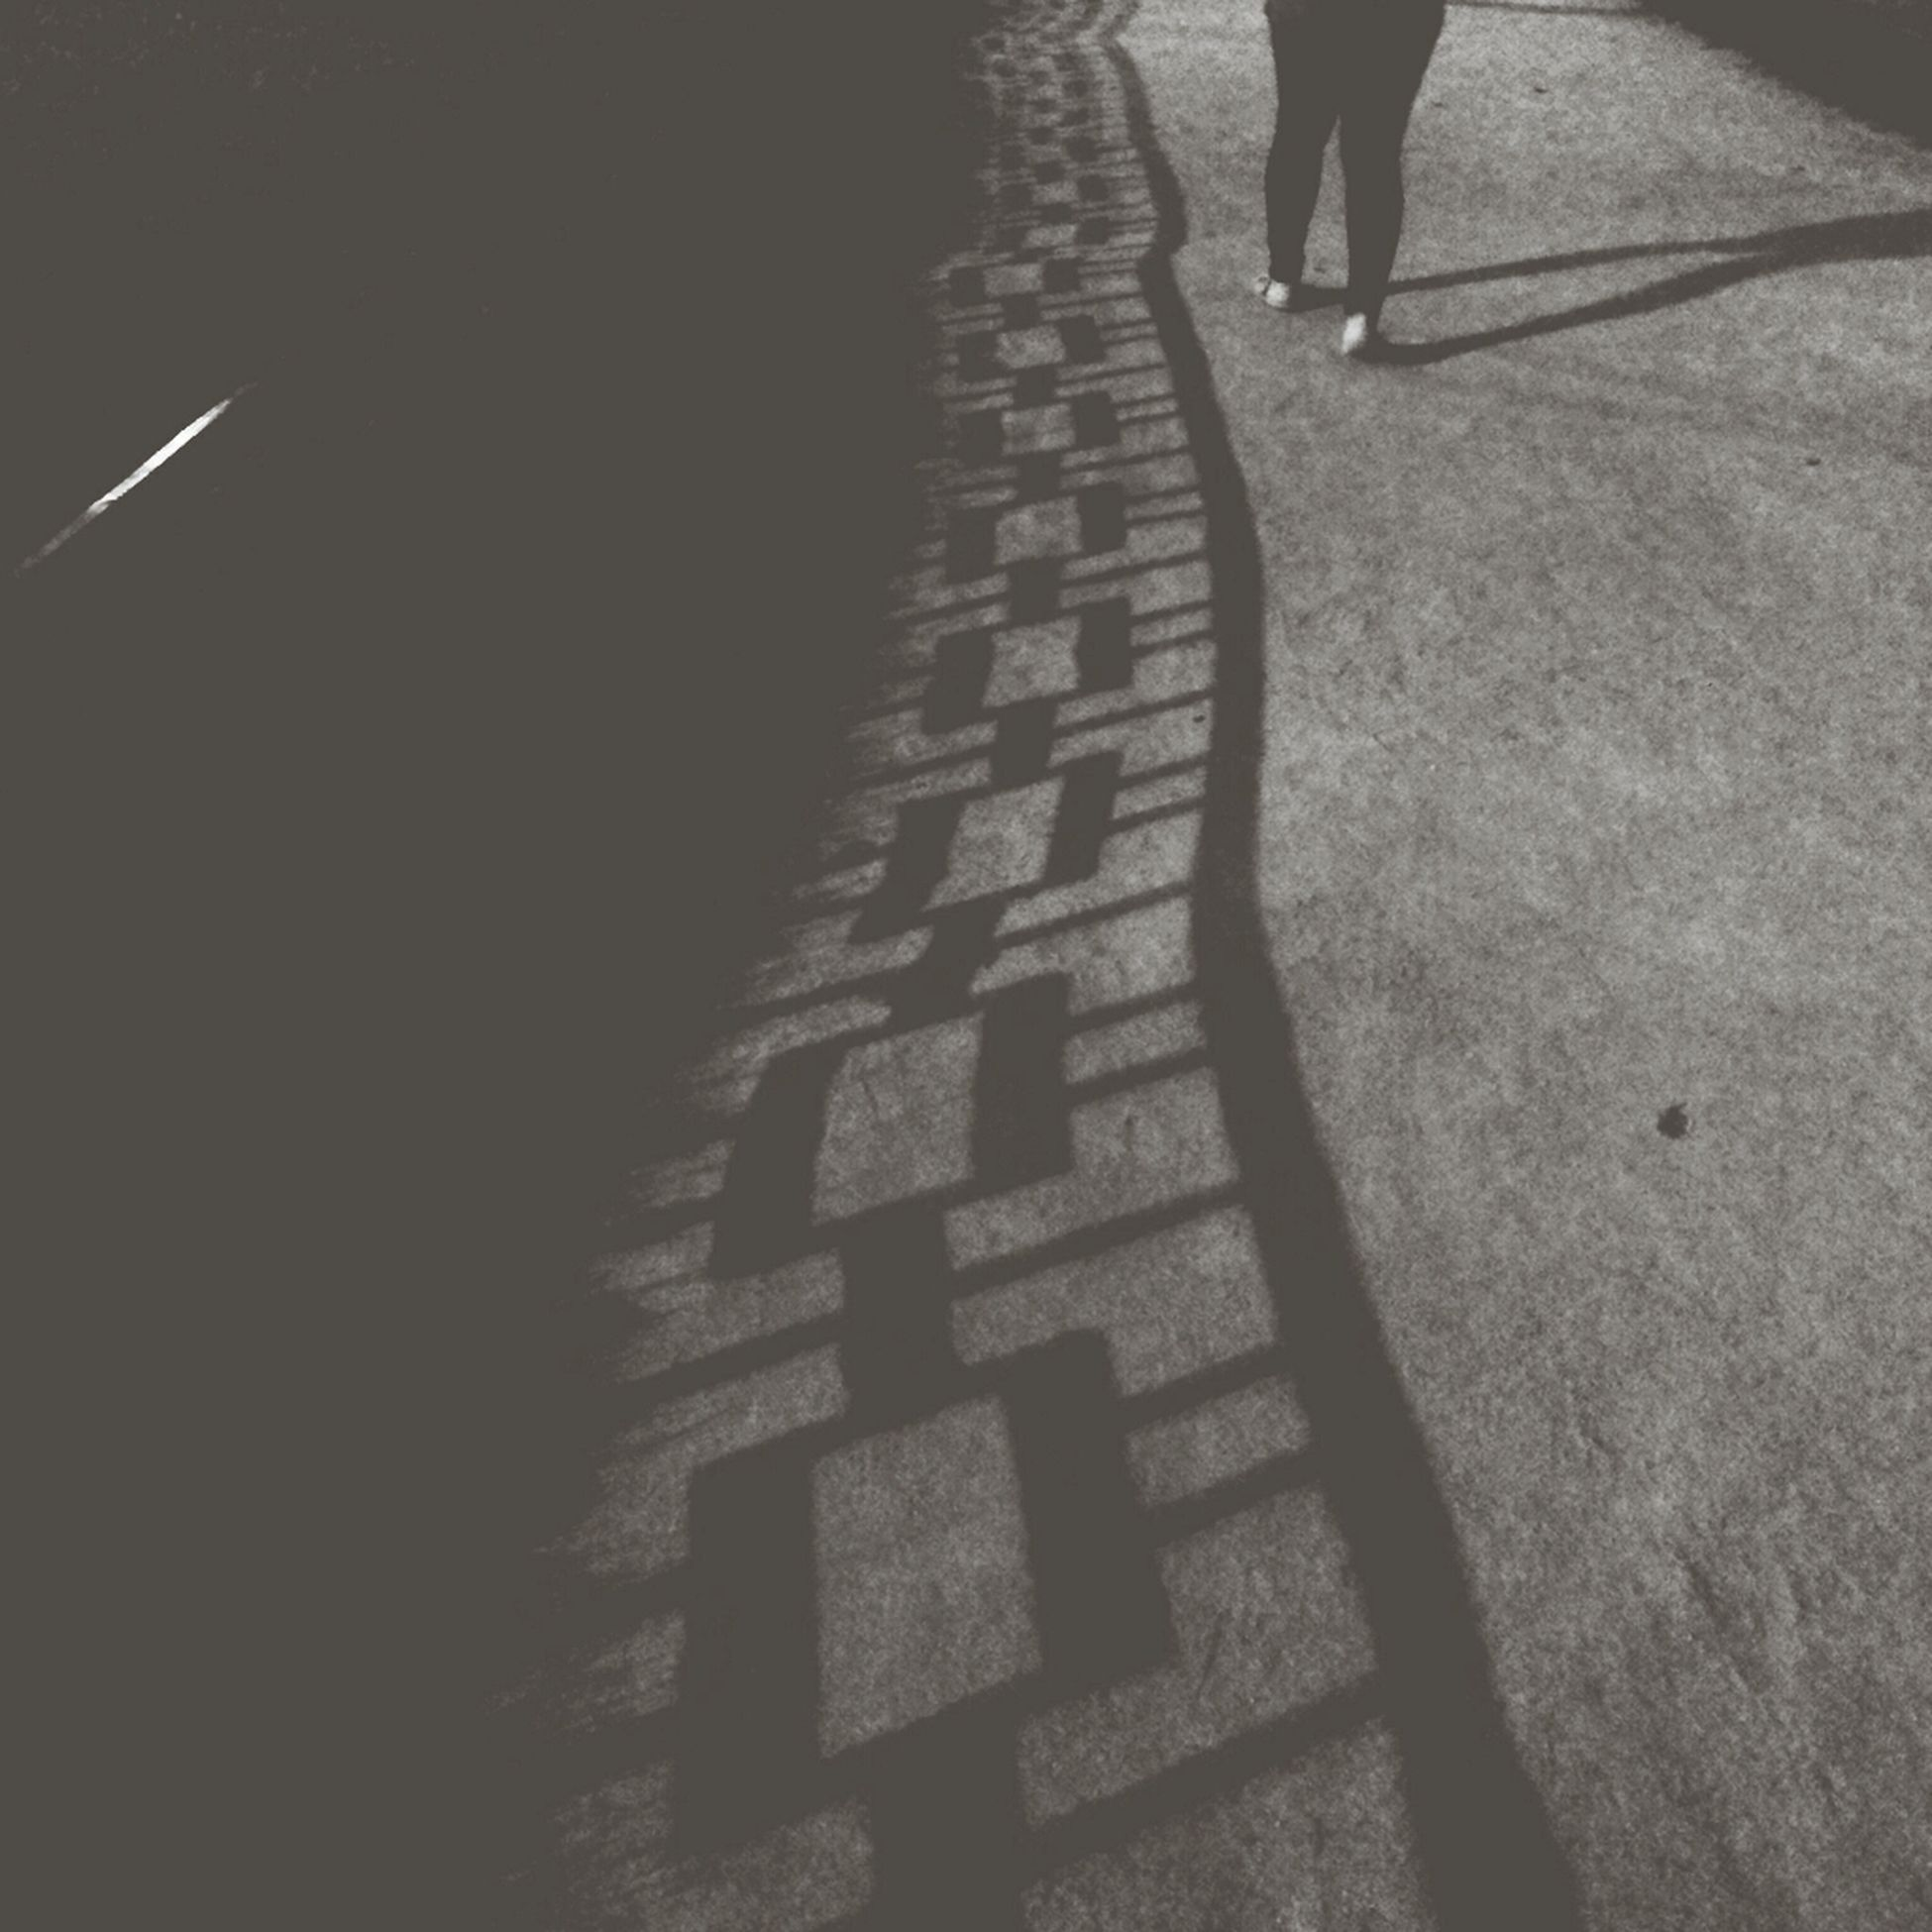 Street Photography Travel Photography Shadows Capa Filter